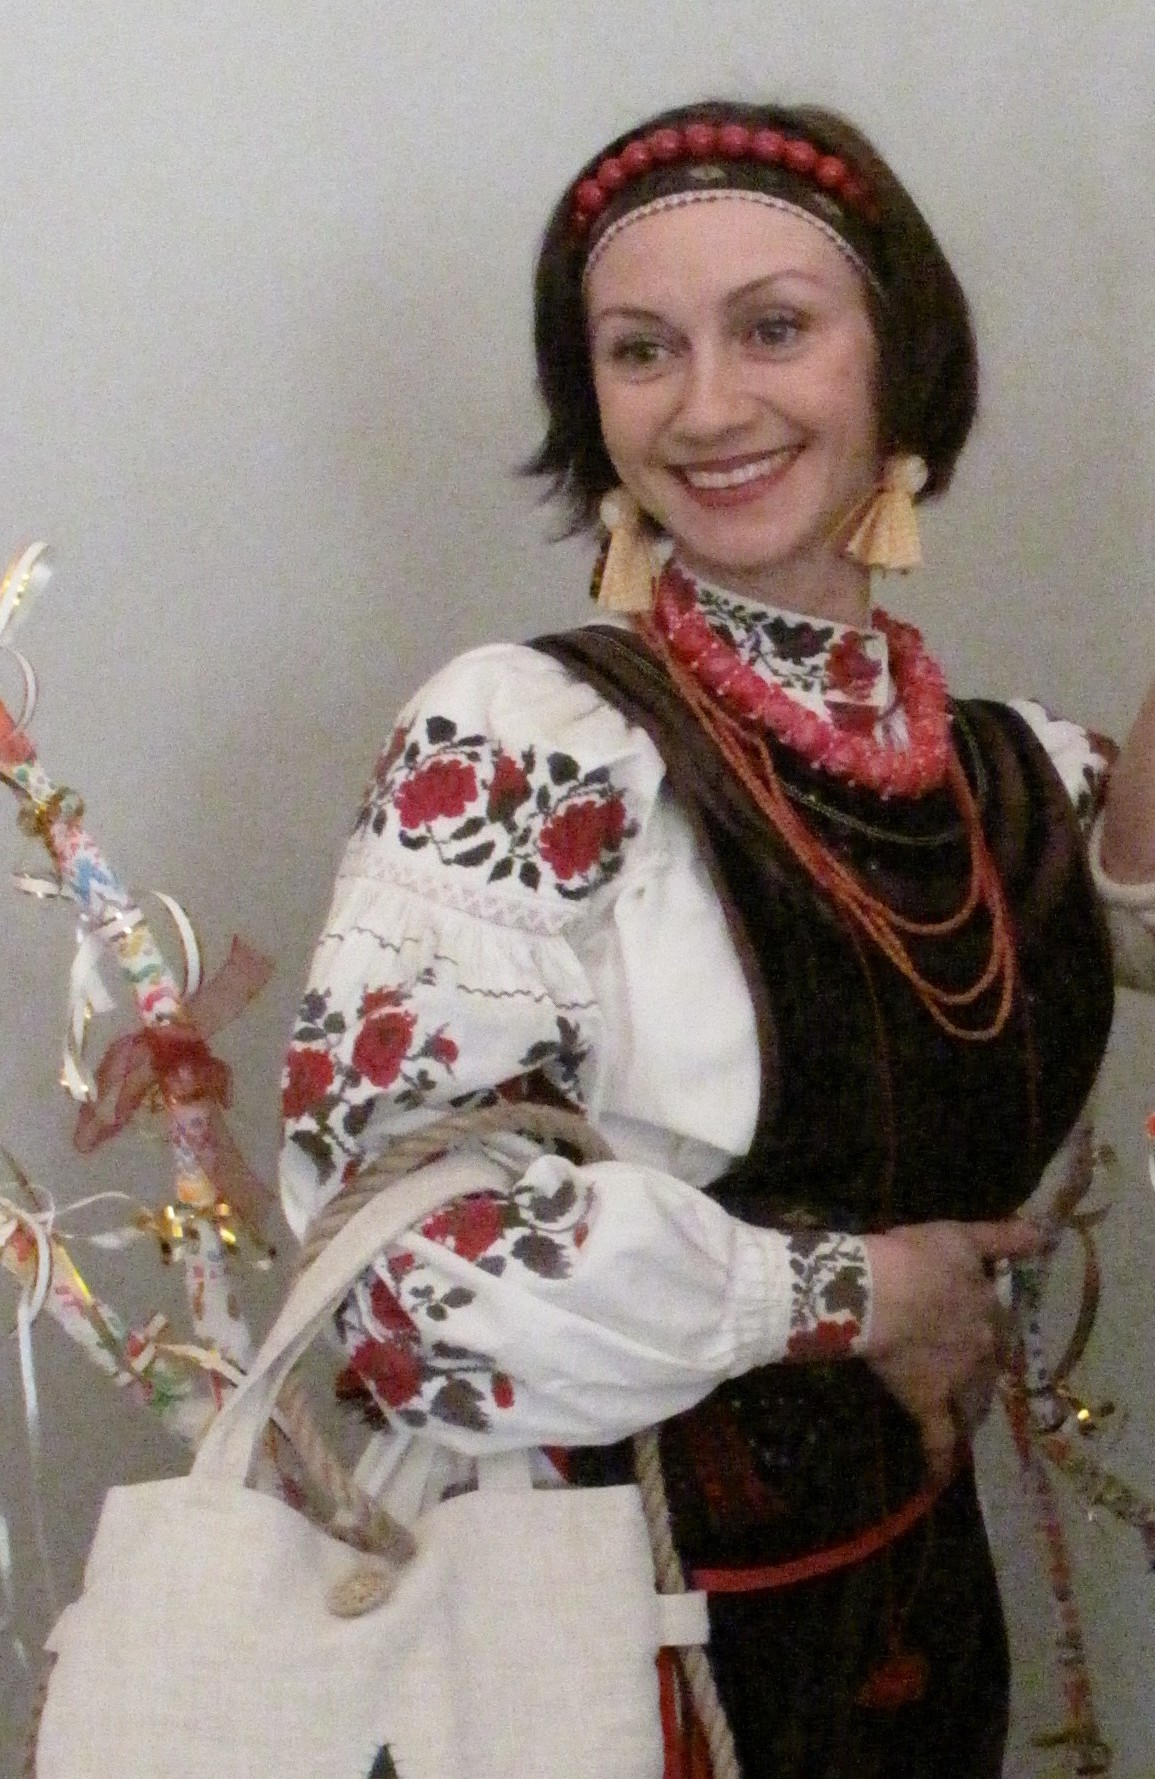 Актриса Молодого театра Римма Зюбина. Фото: Оксана Позднякова/The Epoch Times Украина